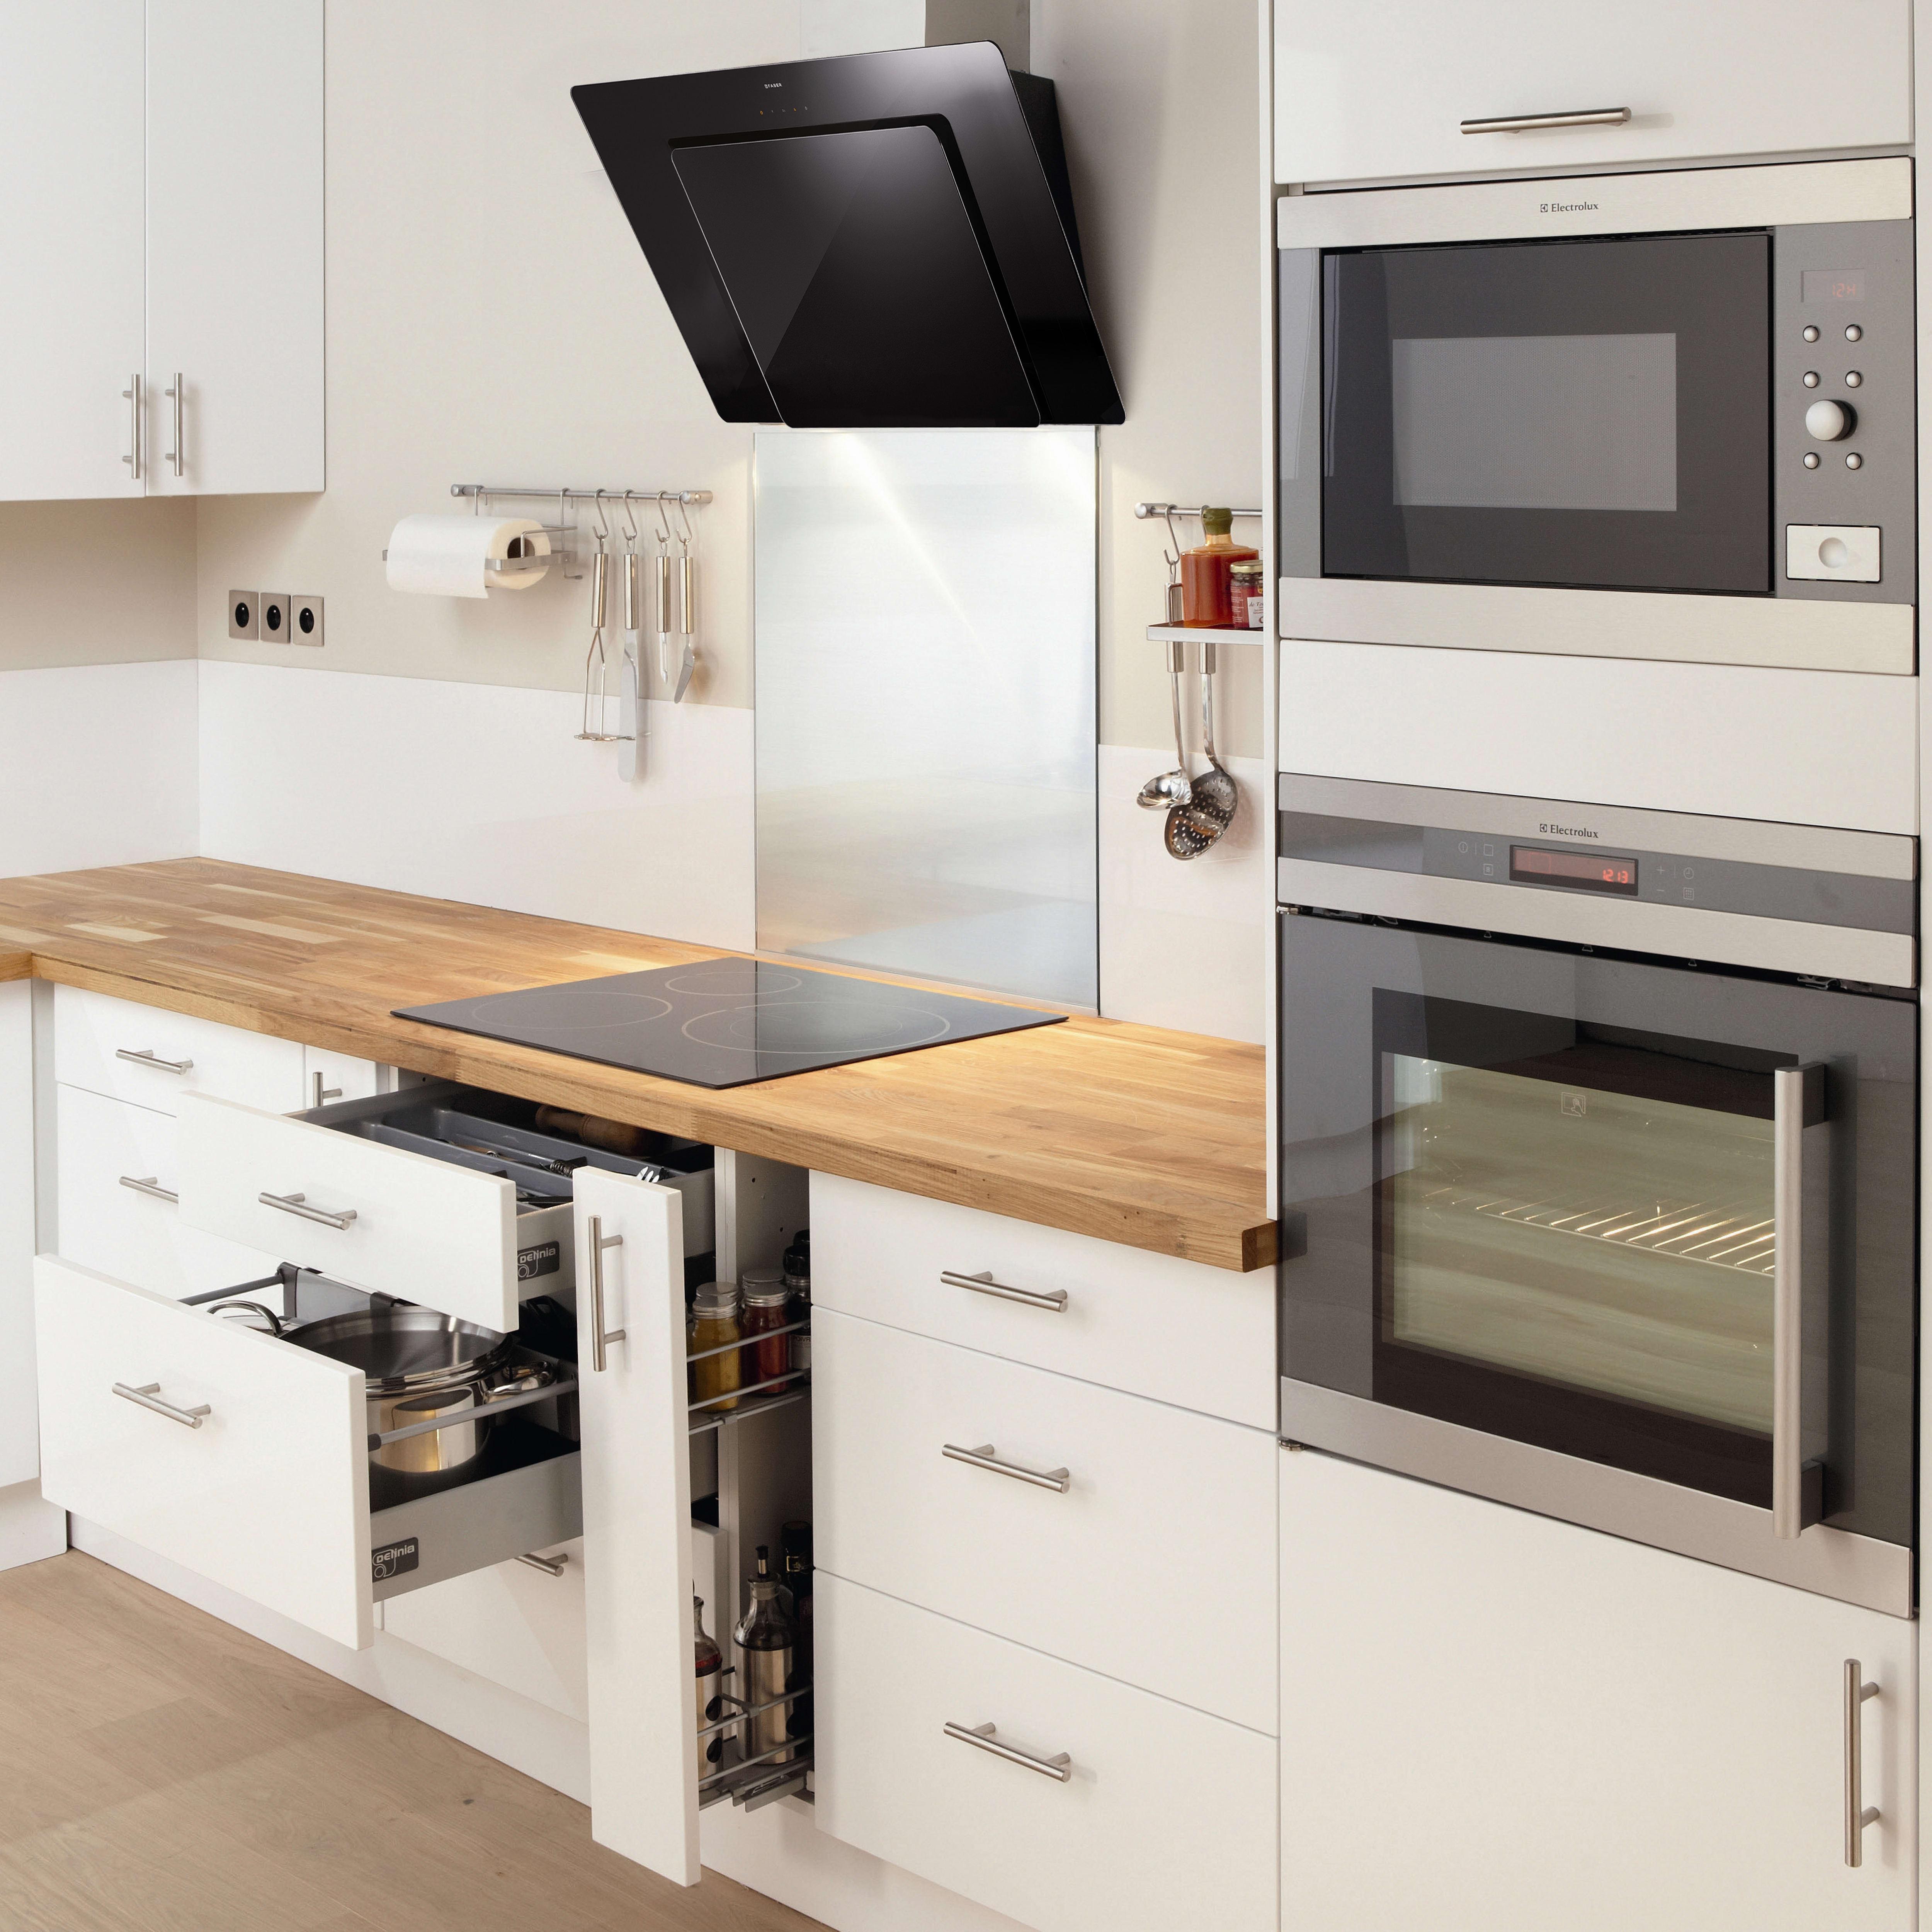 Cucina Delinia Galaxy prezzi e offerte online | Leroy Merlin